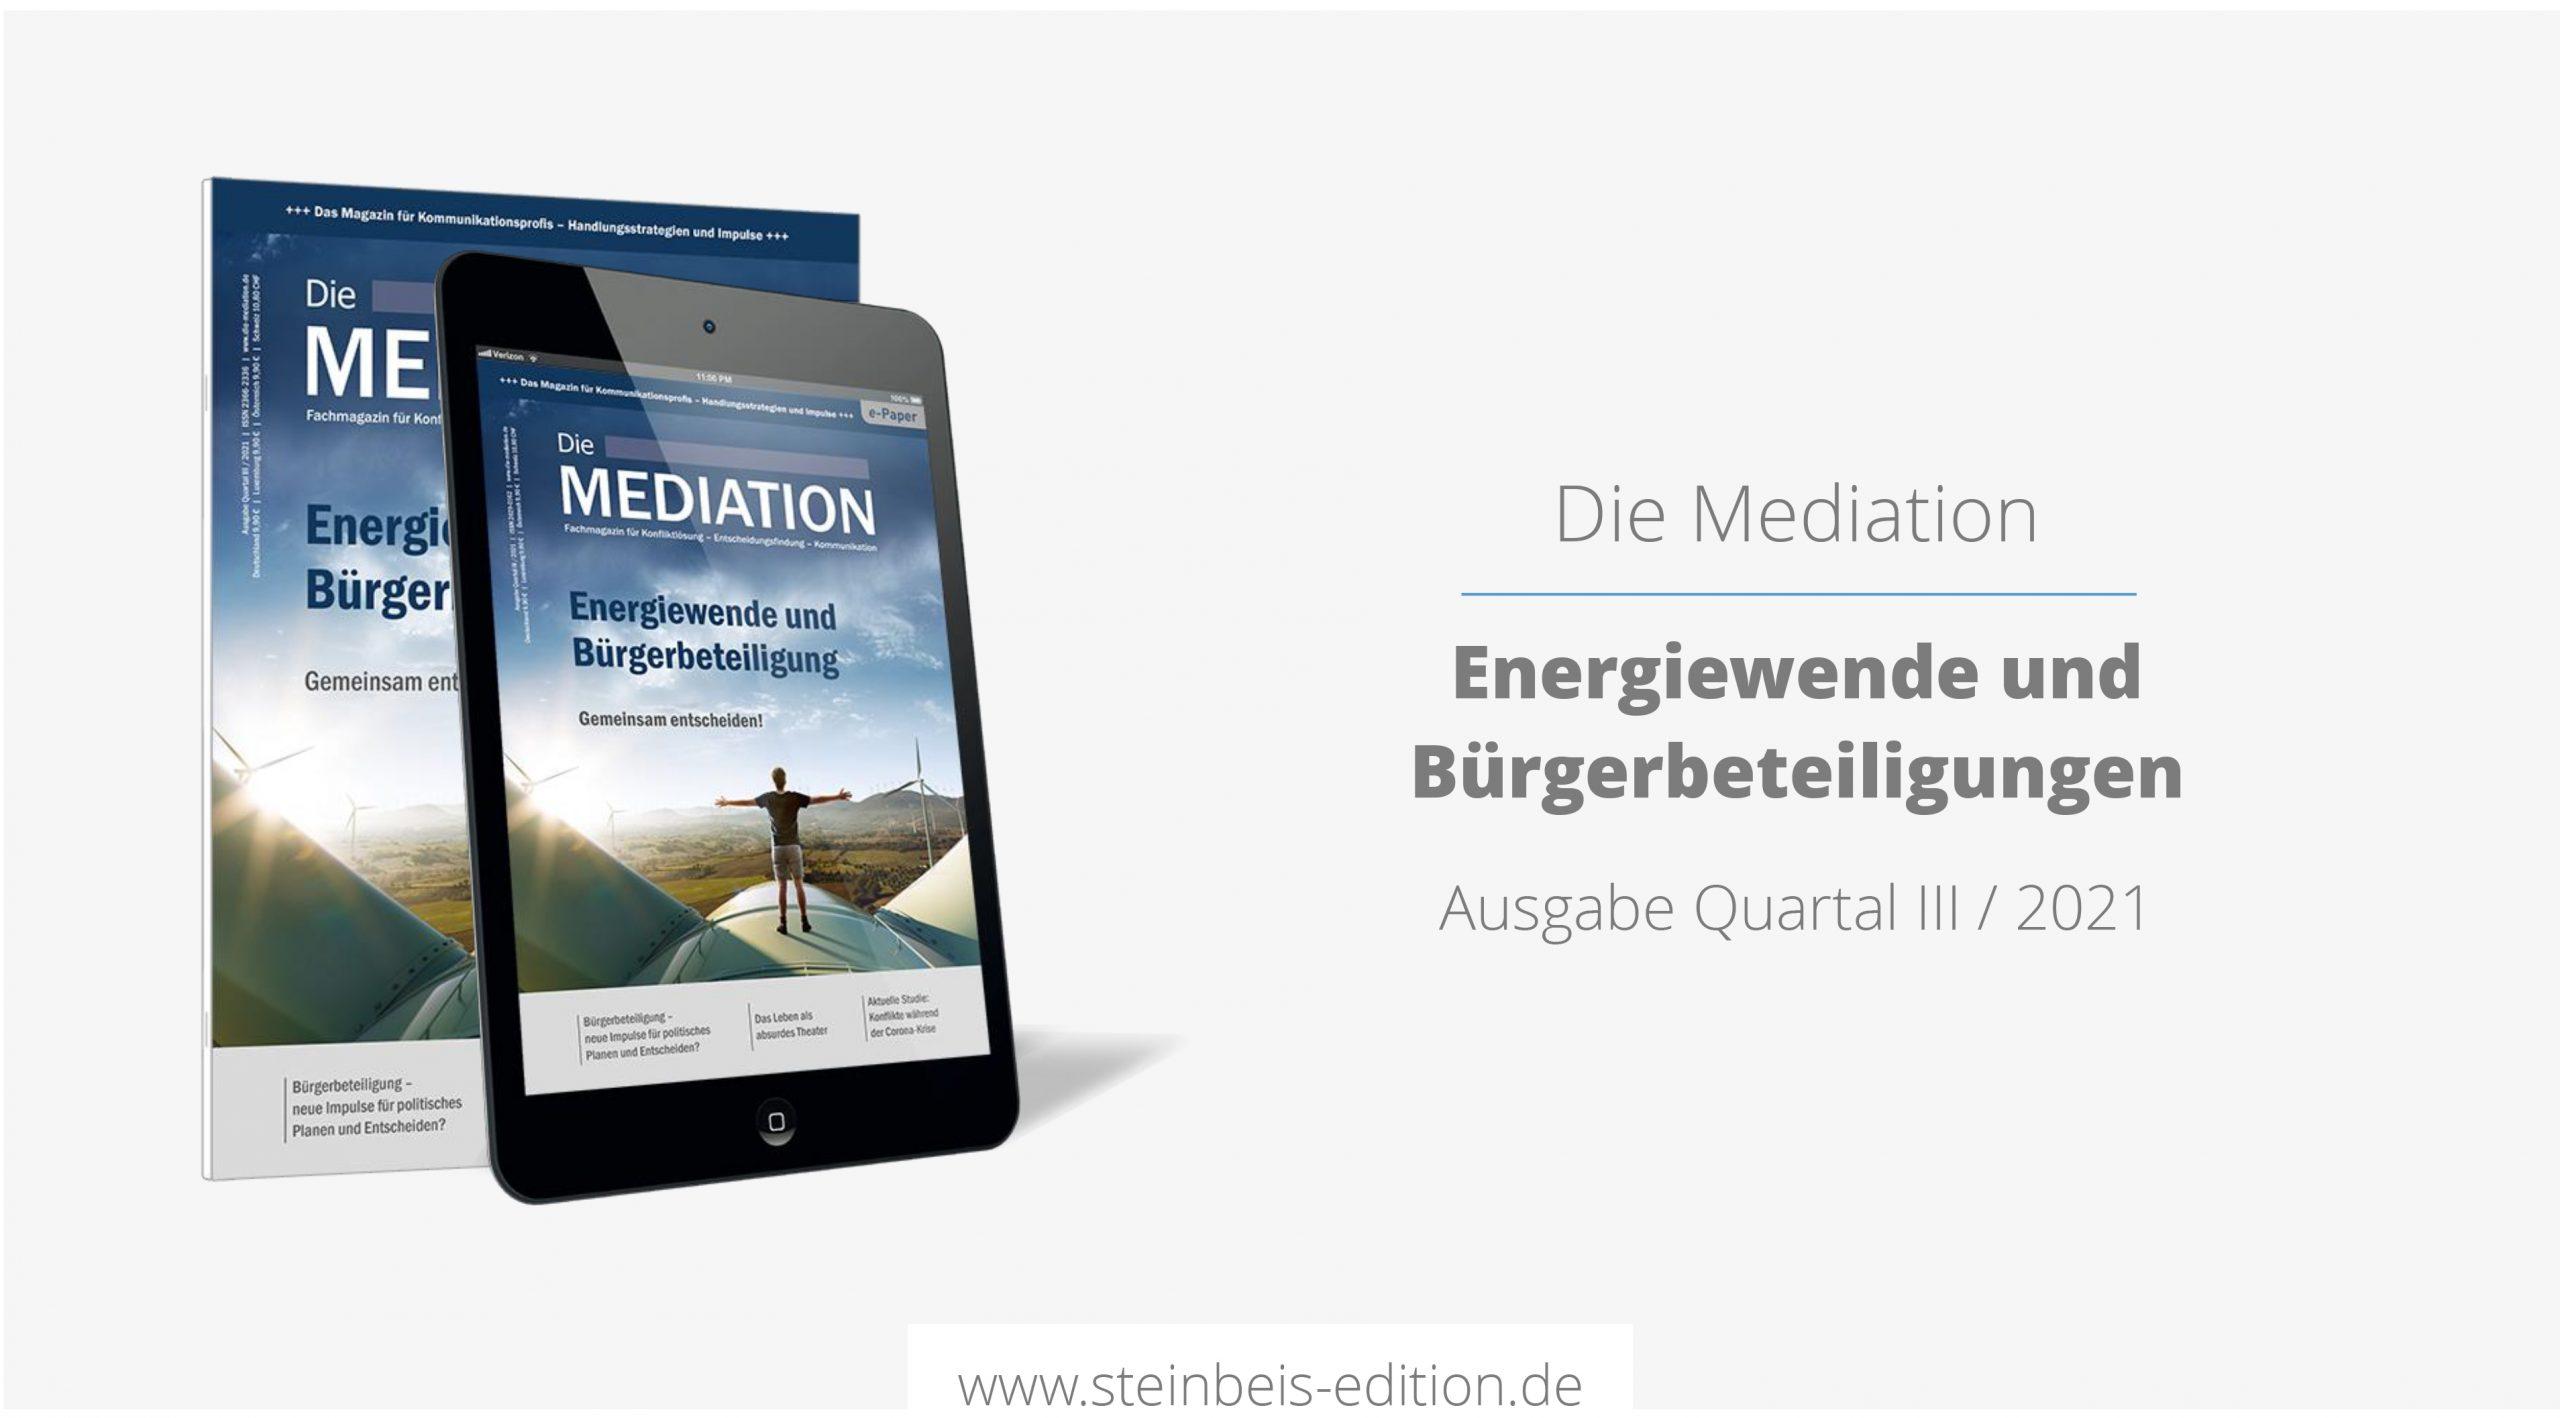 Die Mediation 3/2021 – Energiewende und Bürgerbeteiligung